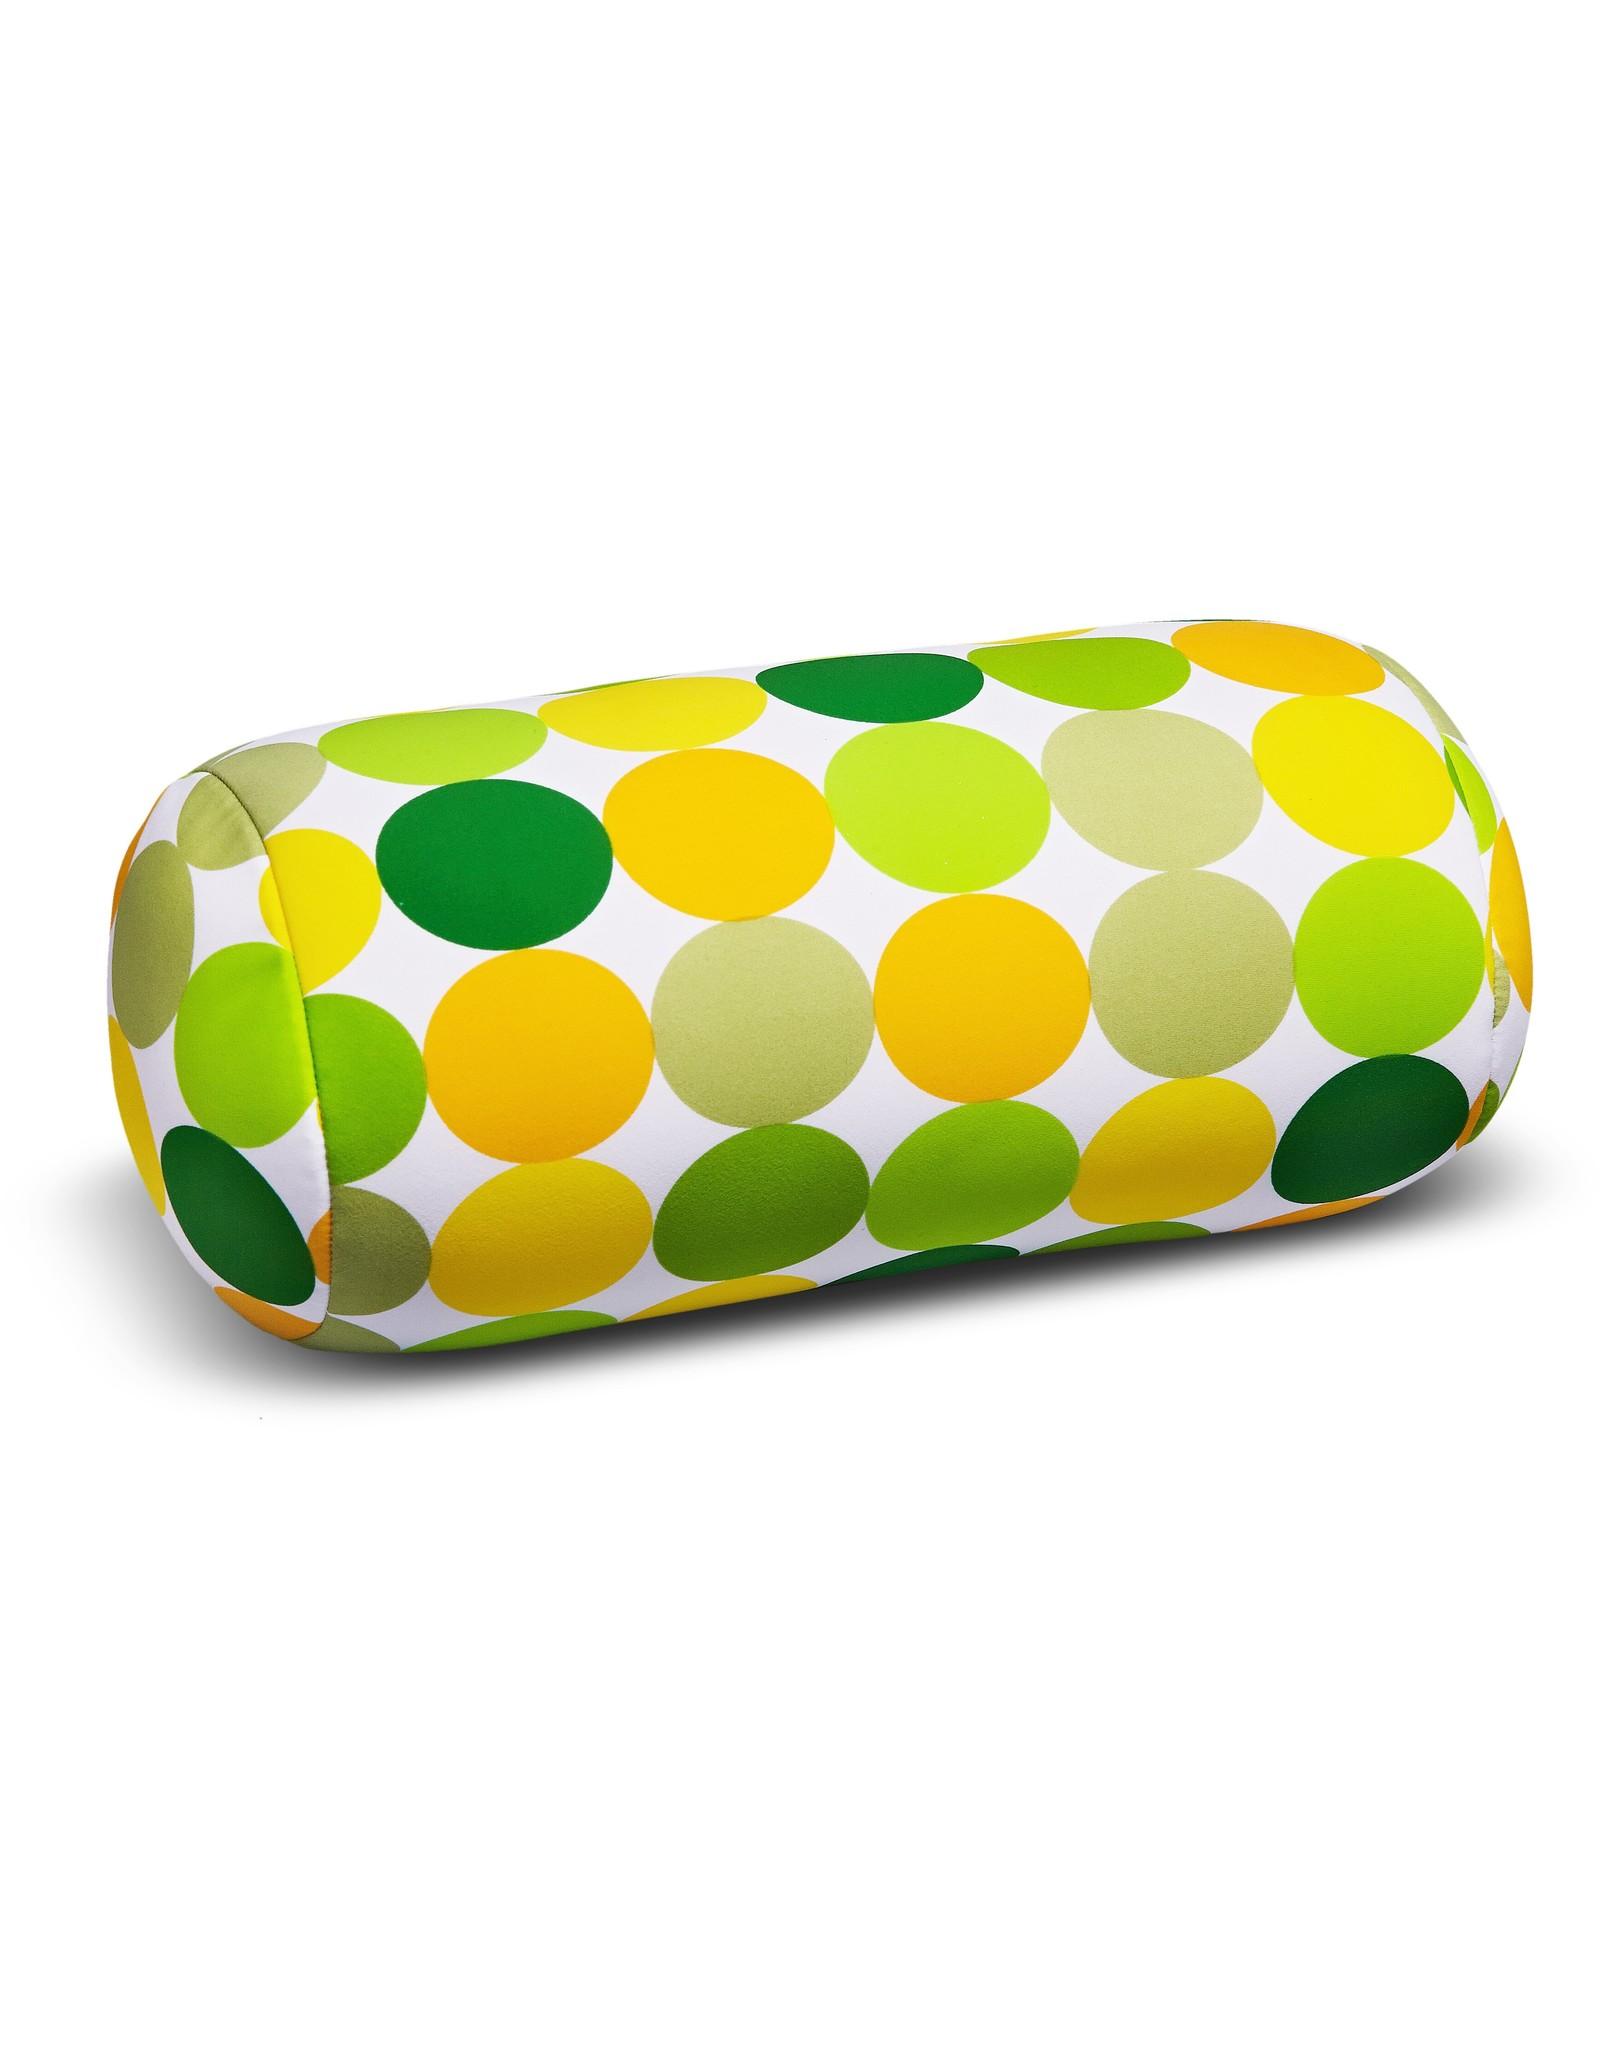 Kuschel-Maxx Kuschel-Maxx - Dots Yellow